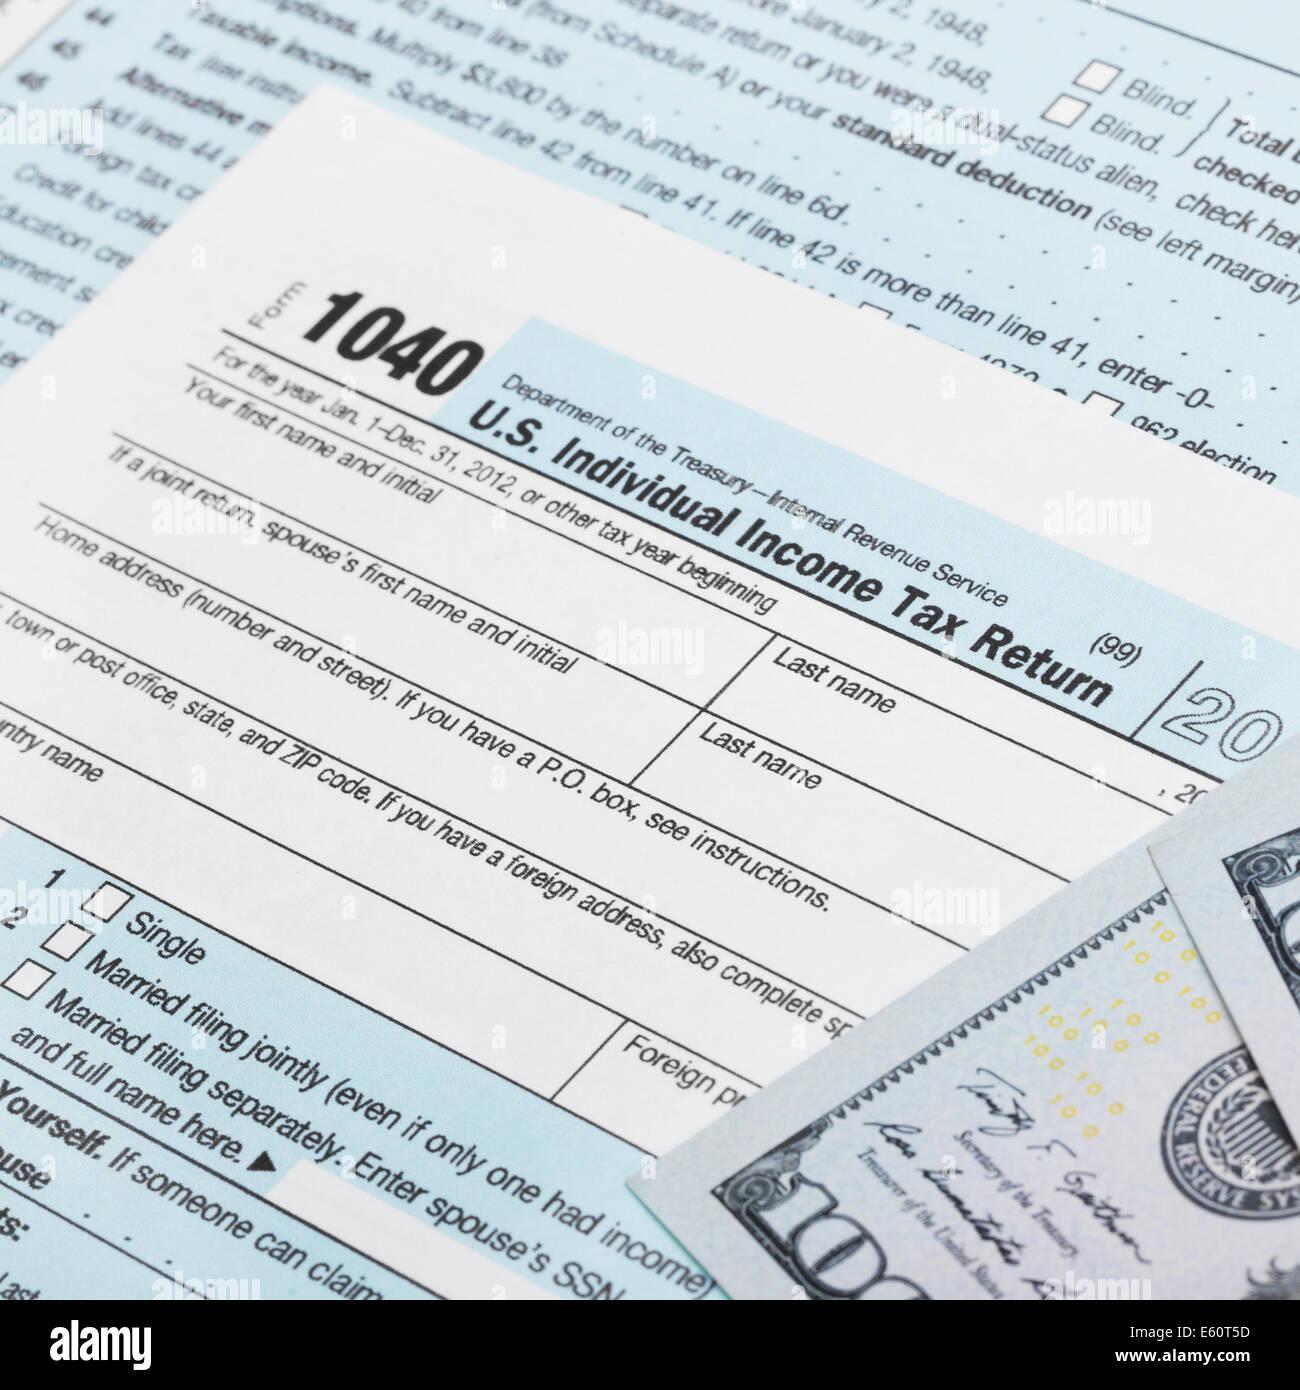 Us 1040 Tax Form Neat Stock Photos Us 1040 Tax Form Neat Stock